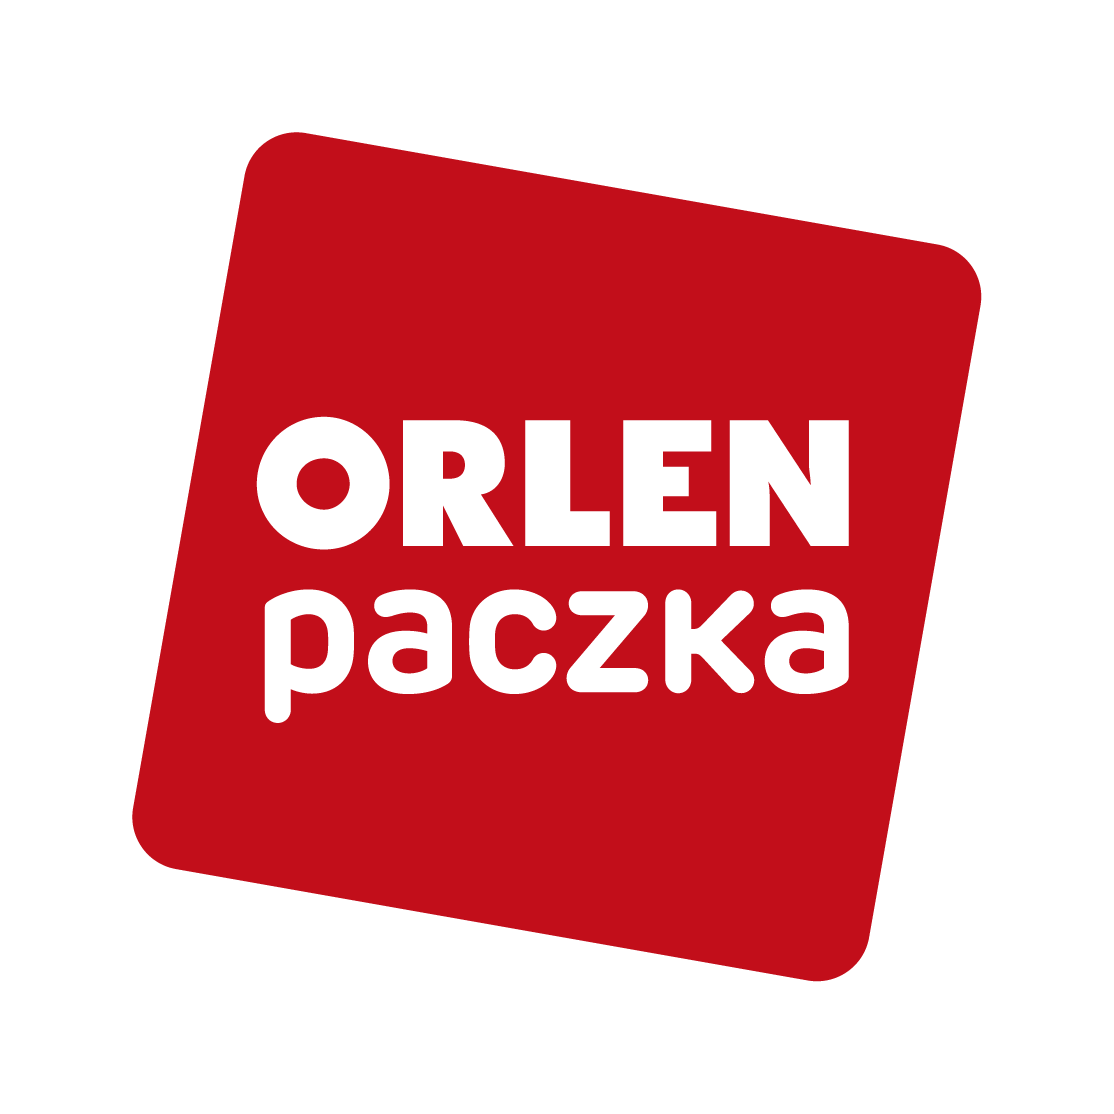 kurierIkony/orlen-paczka